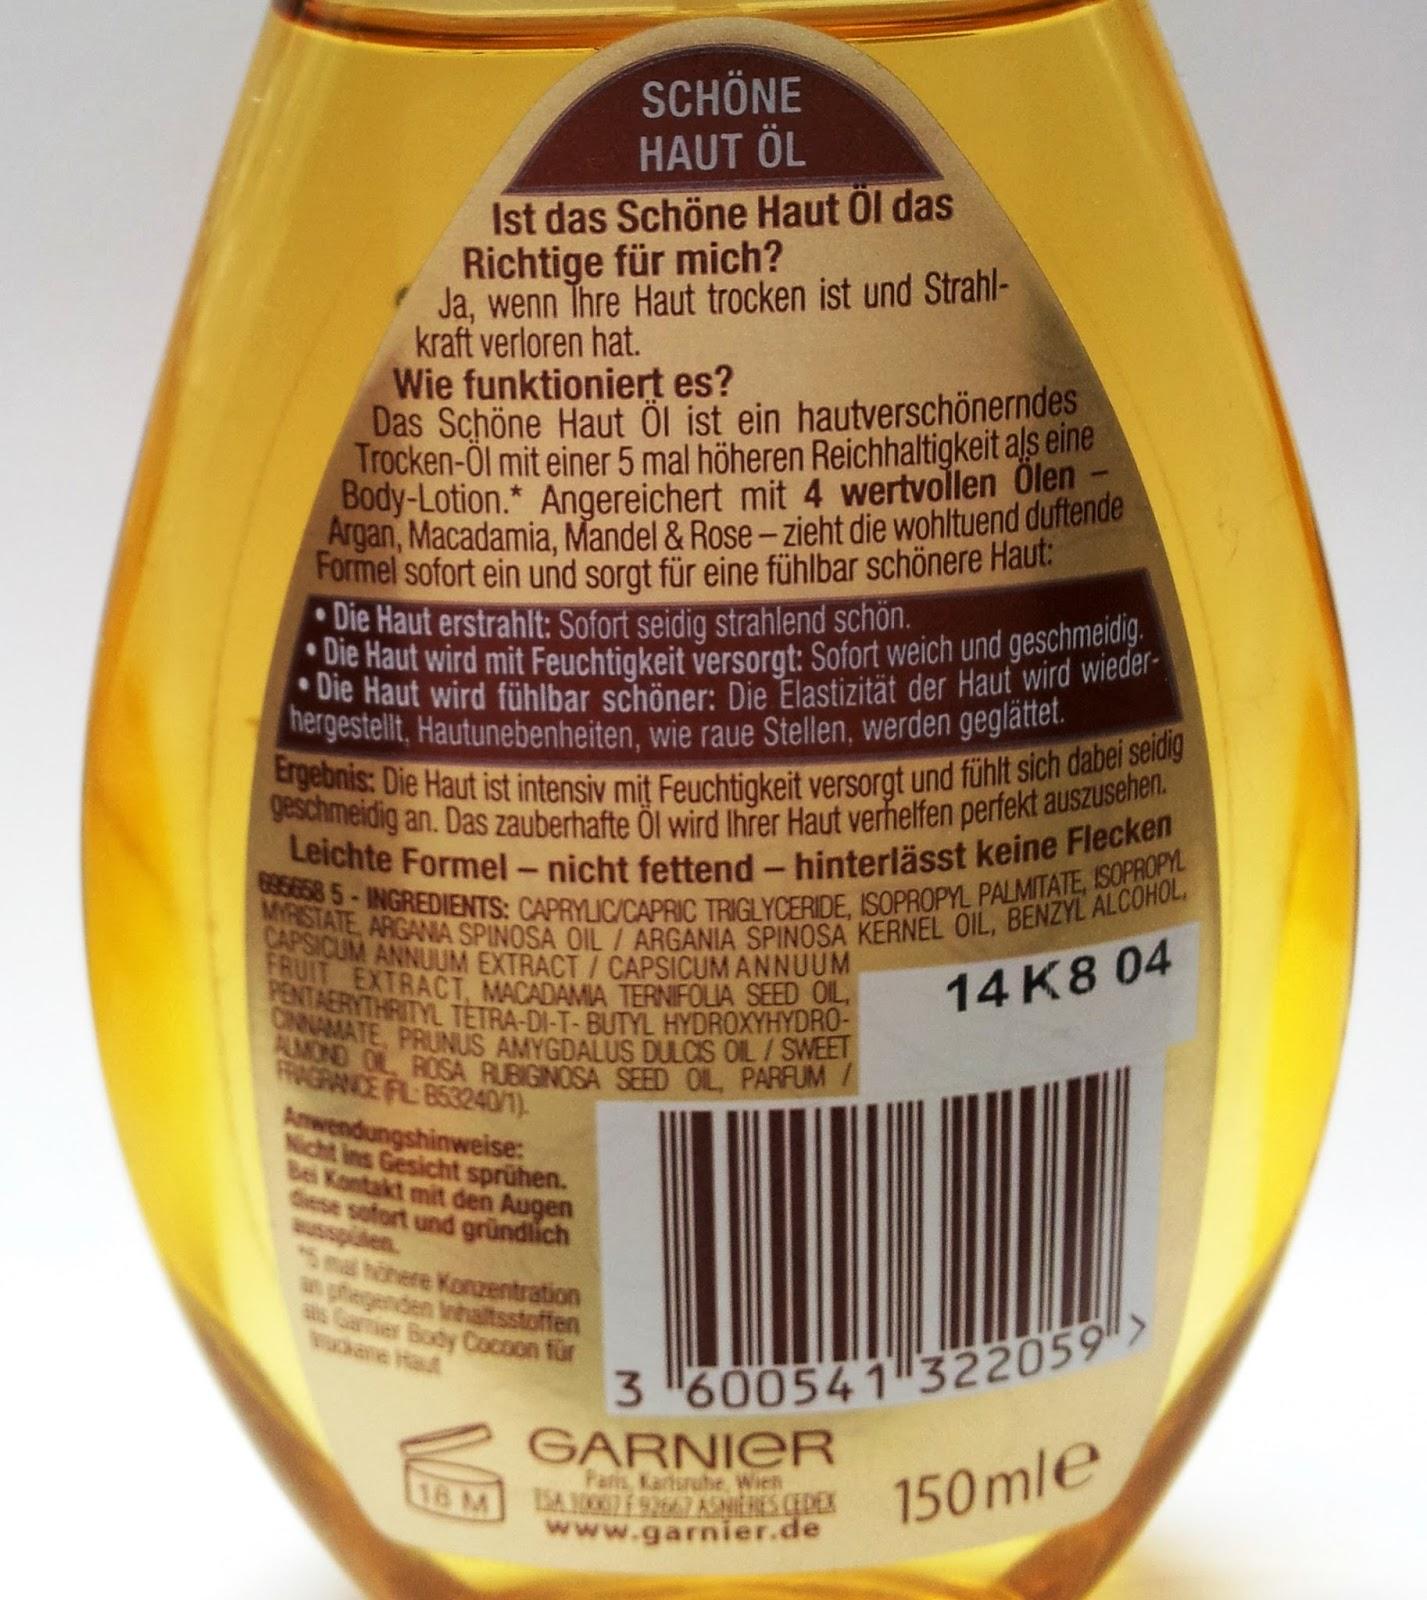 Garnier Schöne Haut Öl INCIS